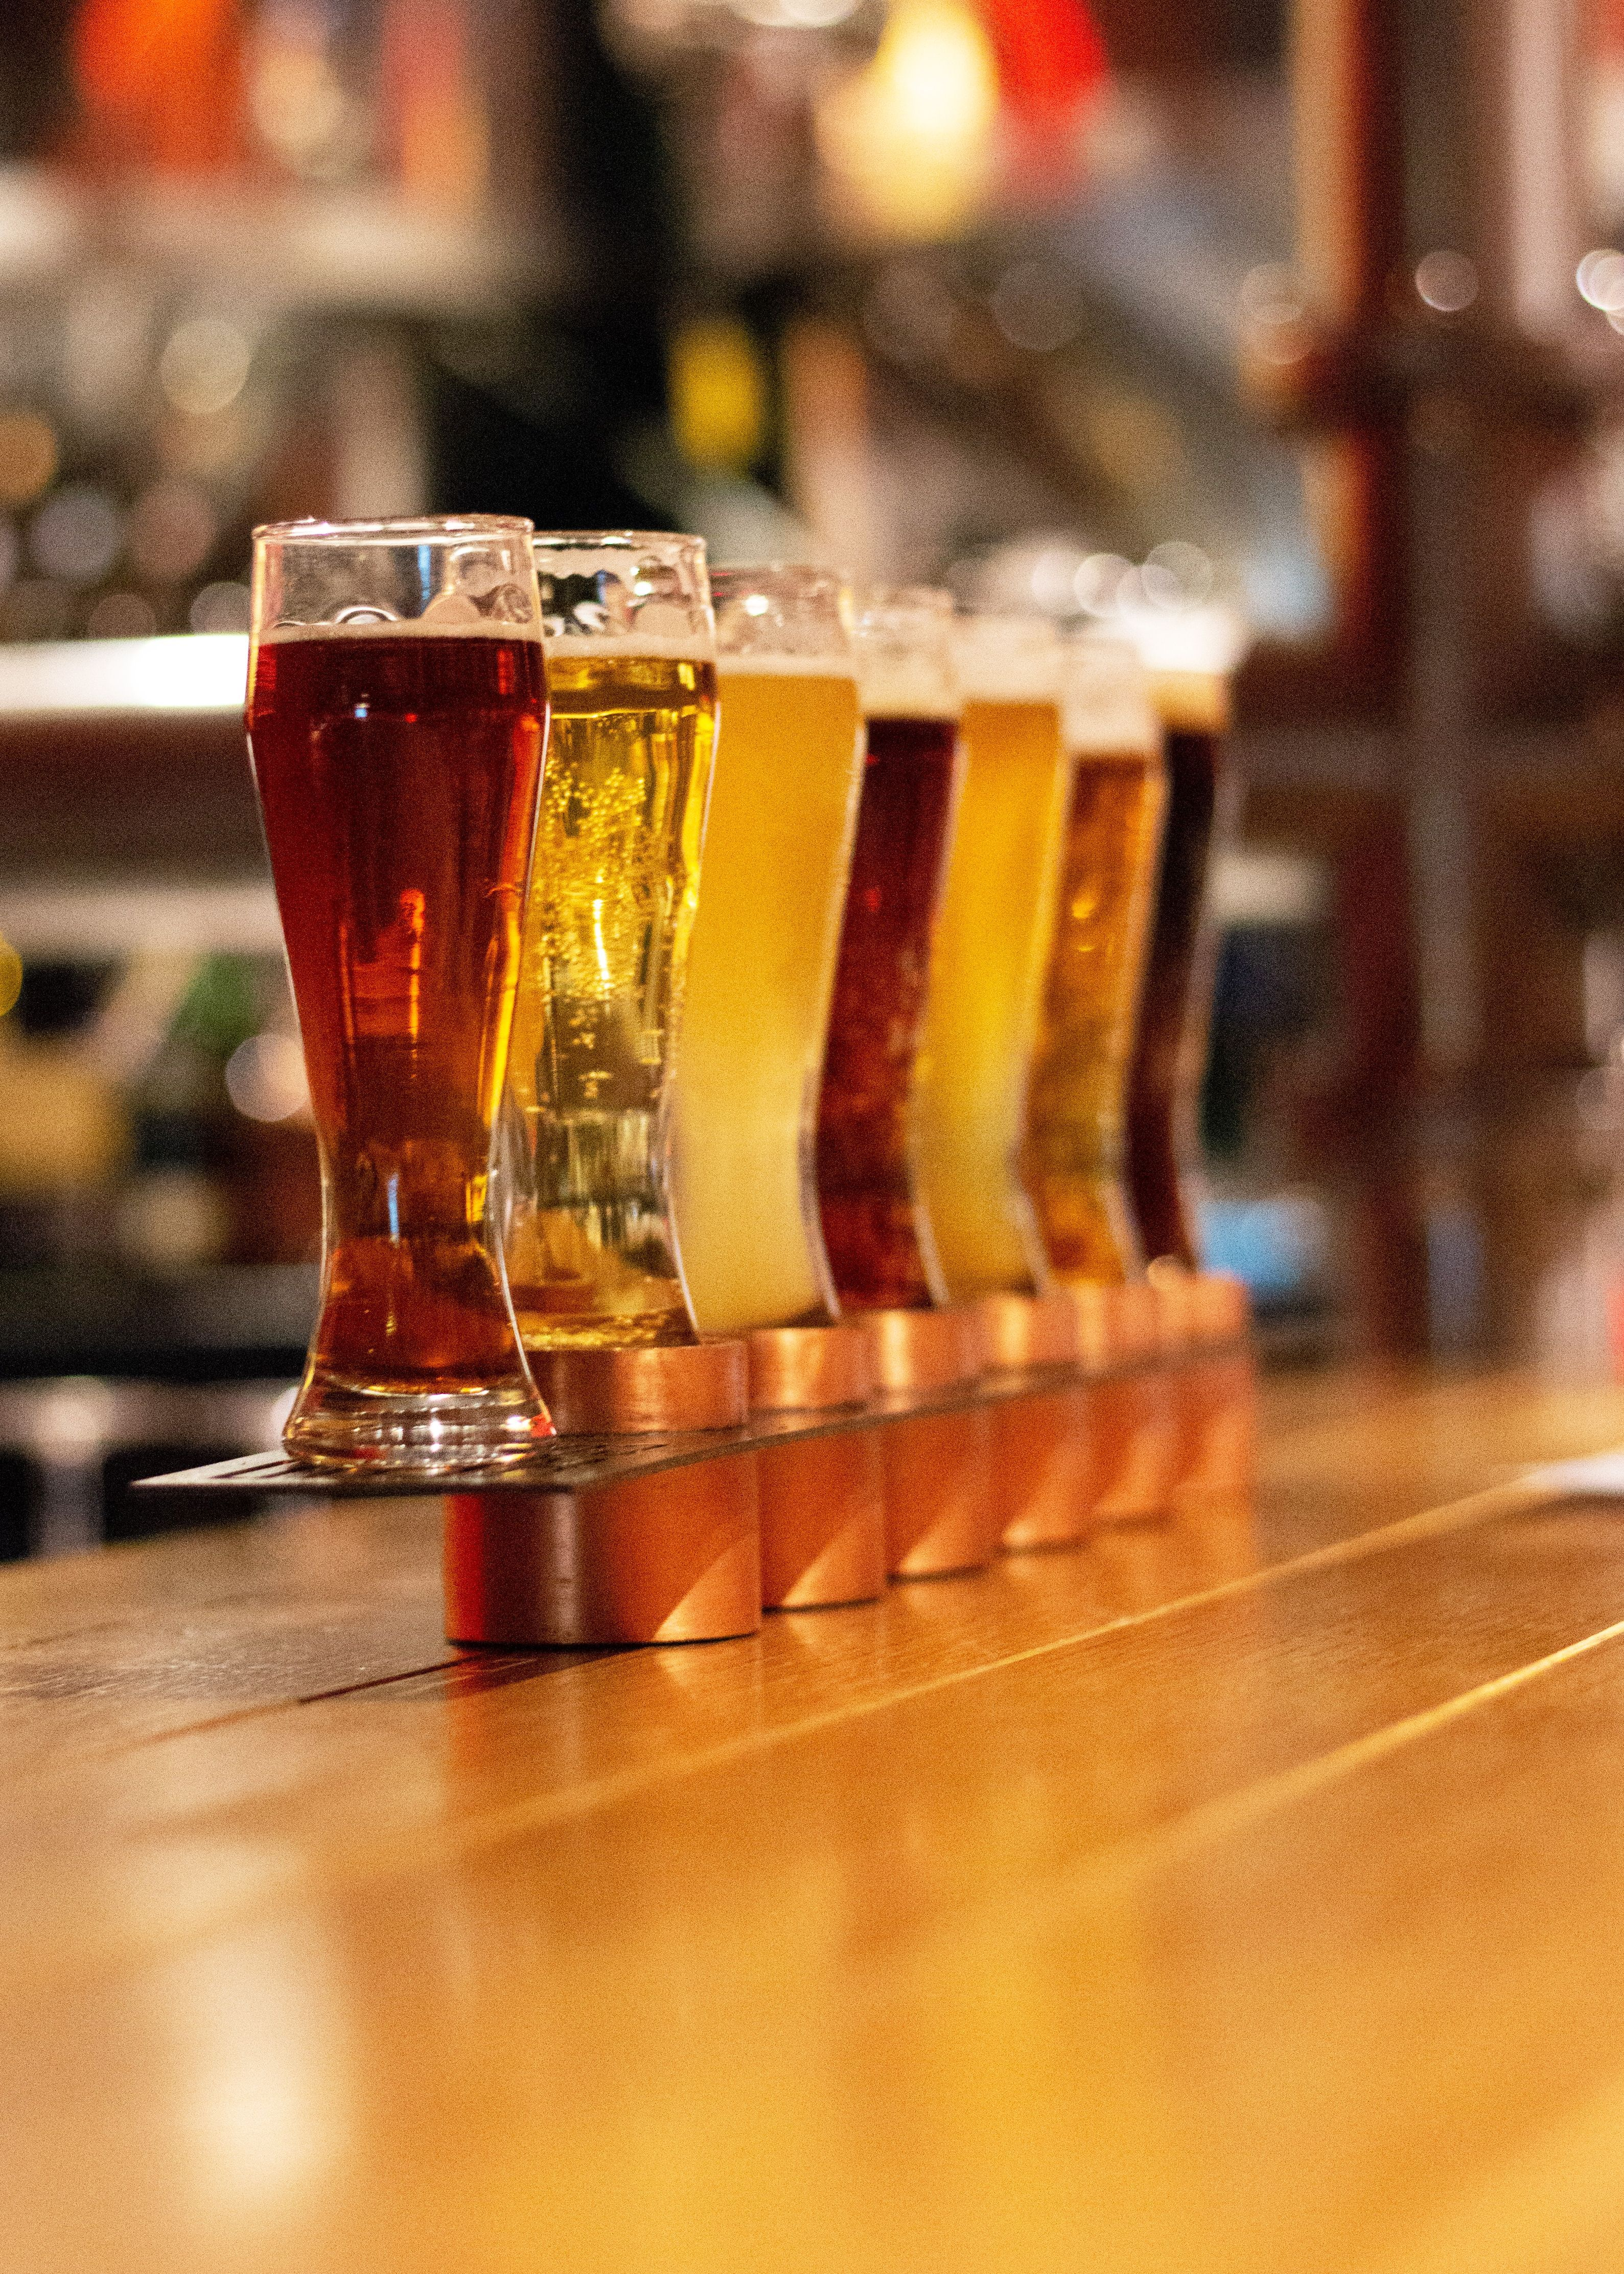 Beer_kyryll-ushakov-flenqflm6xu-unsplash_edit